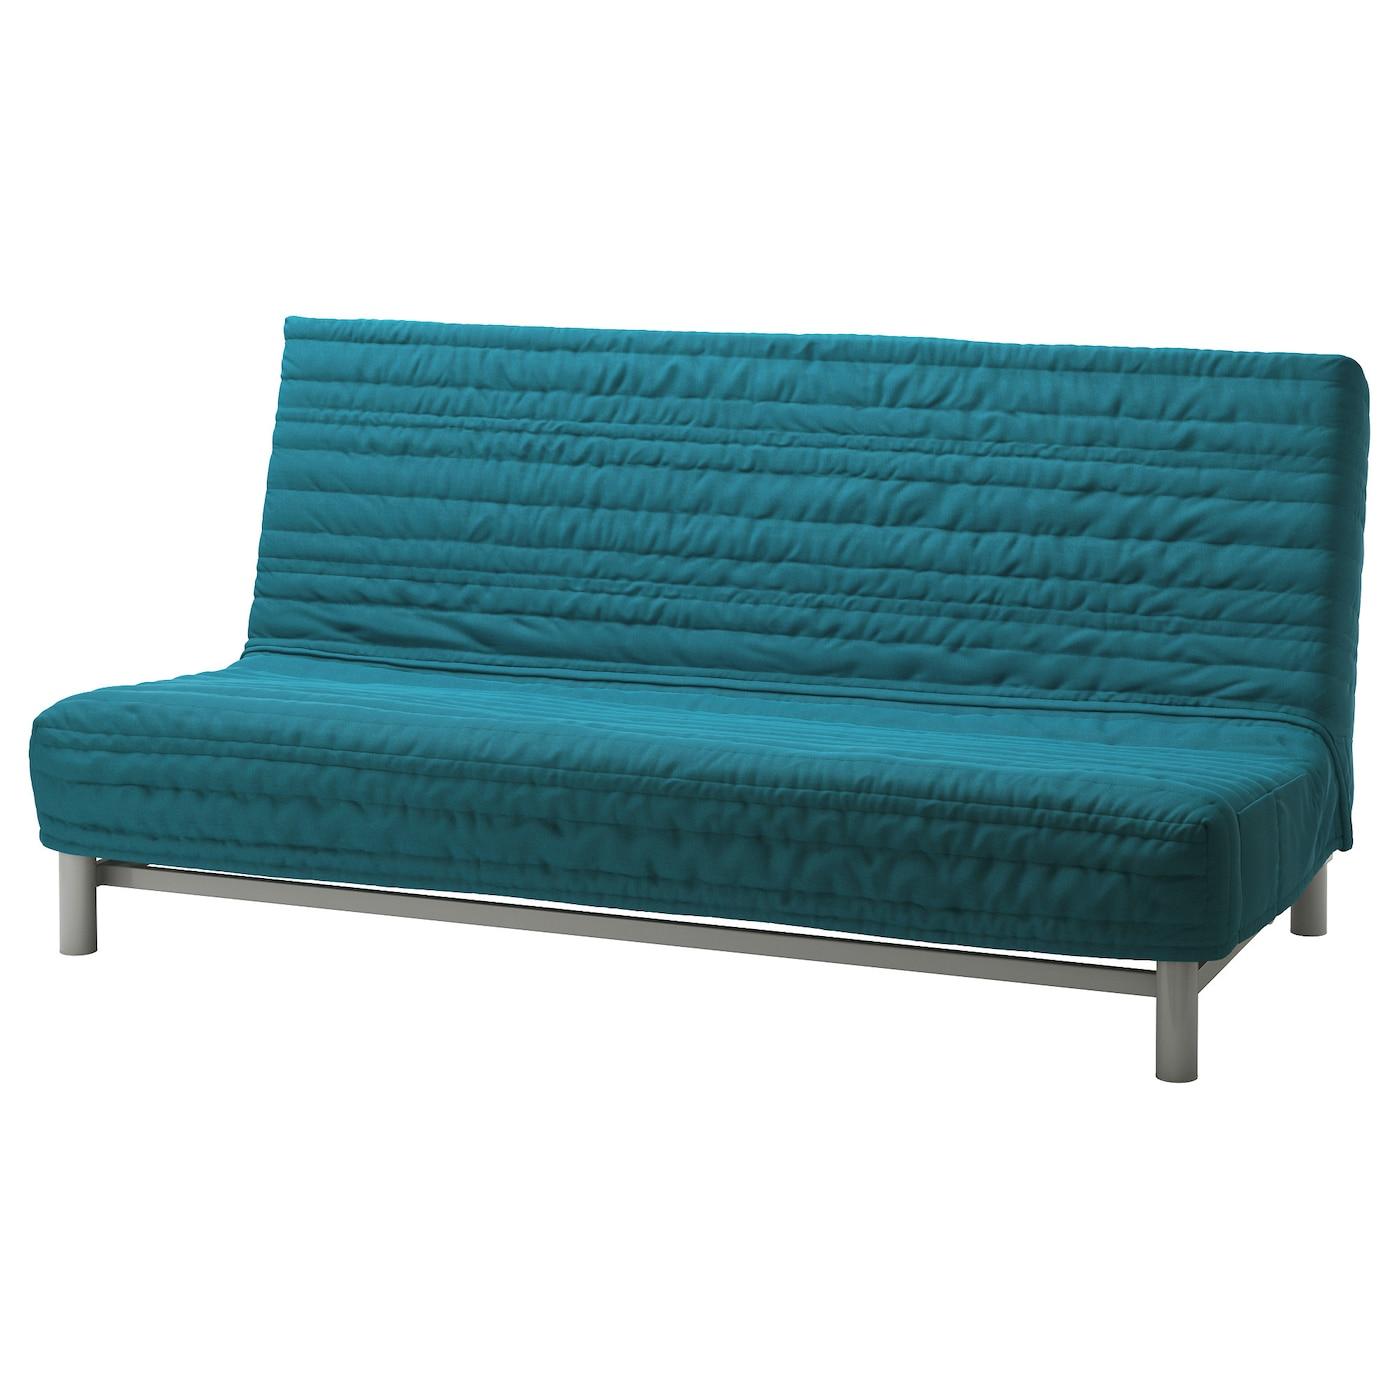 BEDDINGE LVS Threeseat sofabed Knisa turquoise IKEA